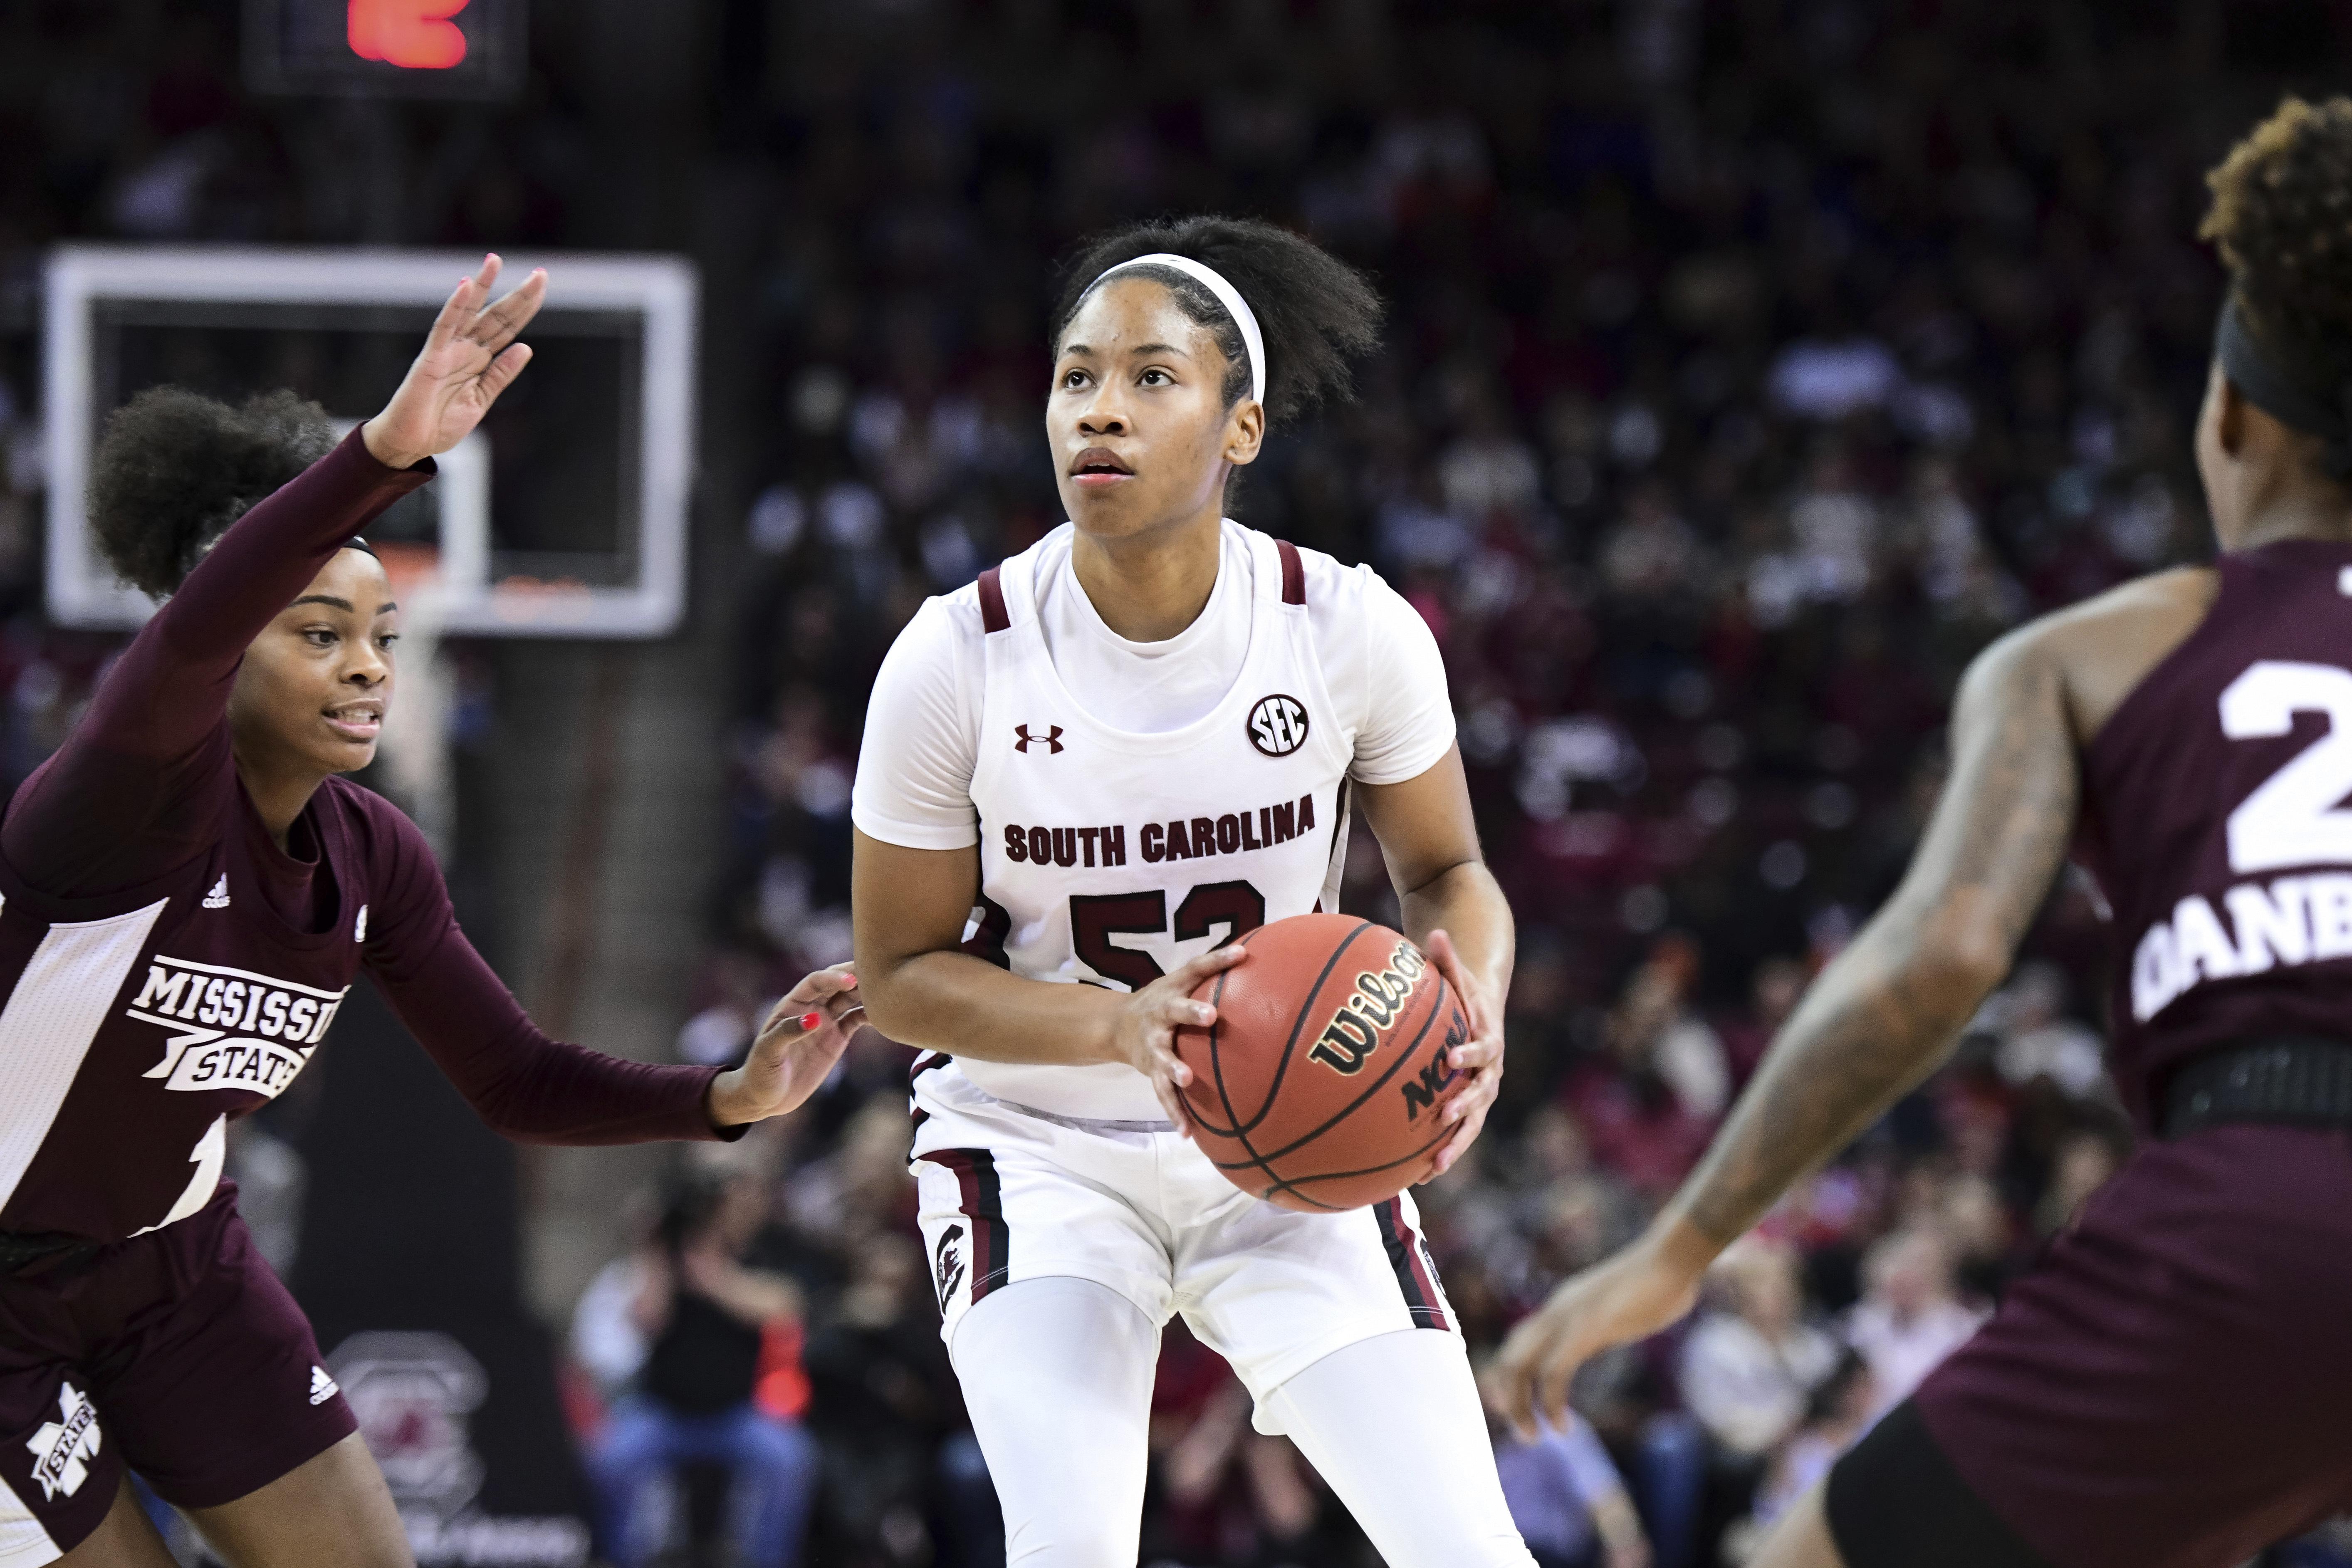 Howard helps No. 1 South Carolina beat No. 9 Miss. St. 81-79